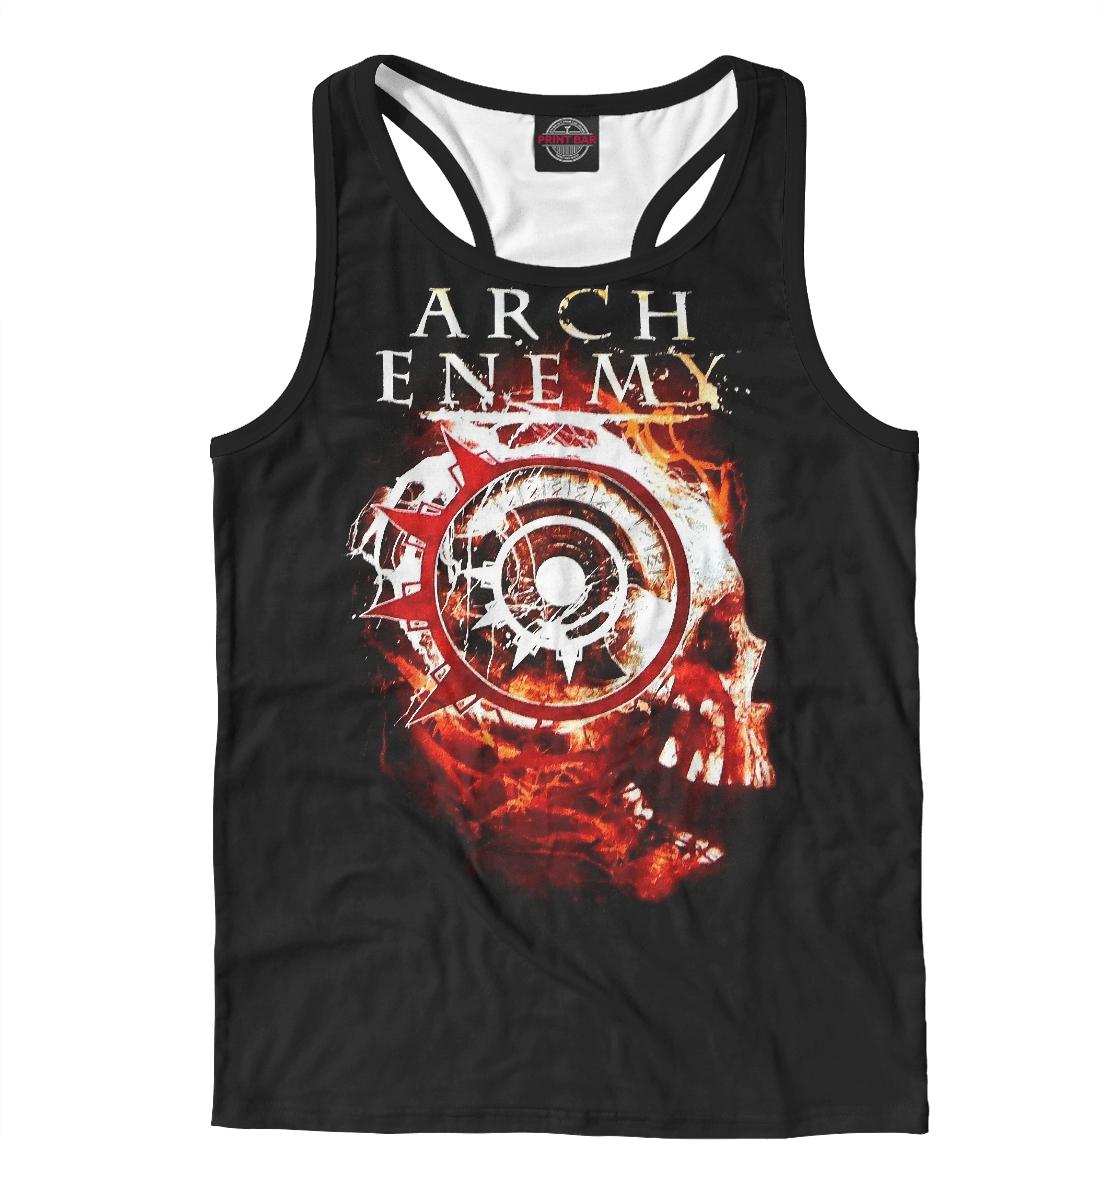 Купить Arch Enemy, Printbar, Майки борцовки, AEN-177937-mayb-2